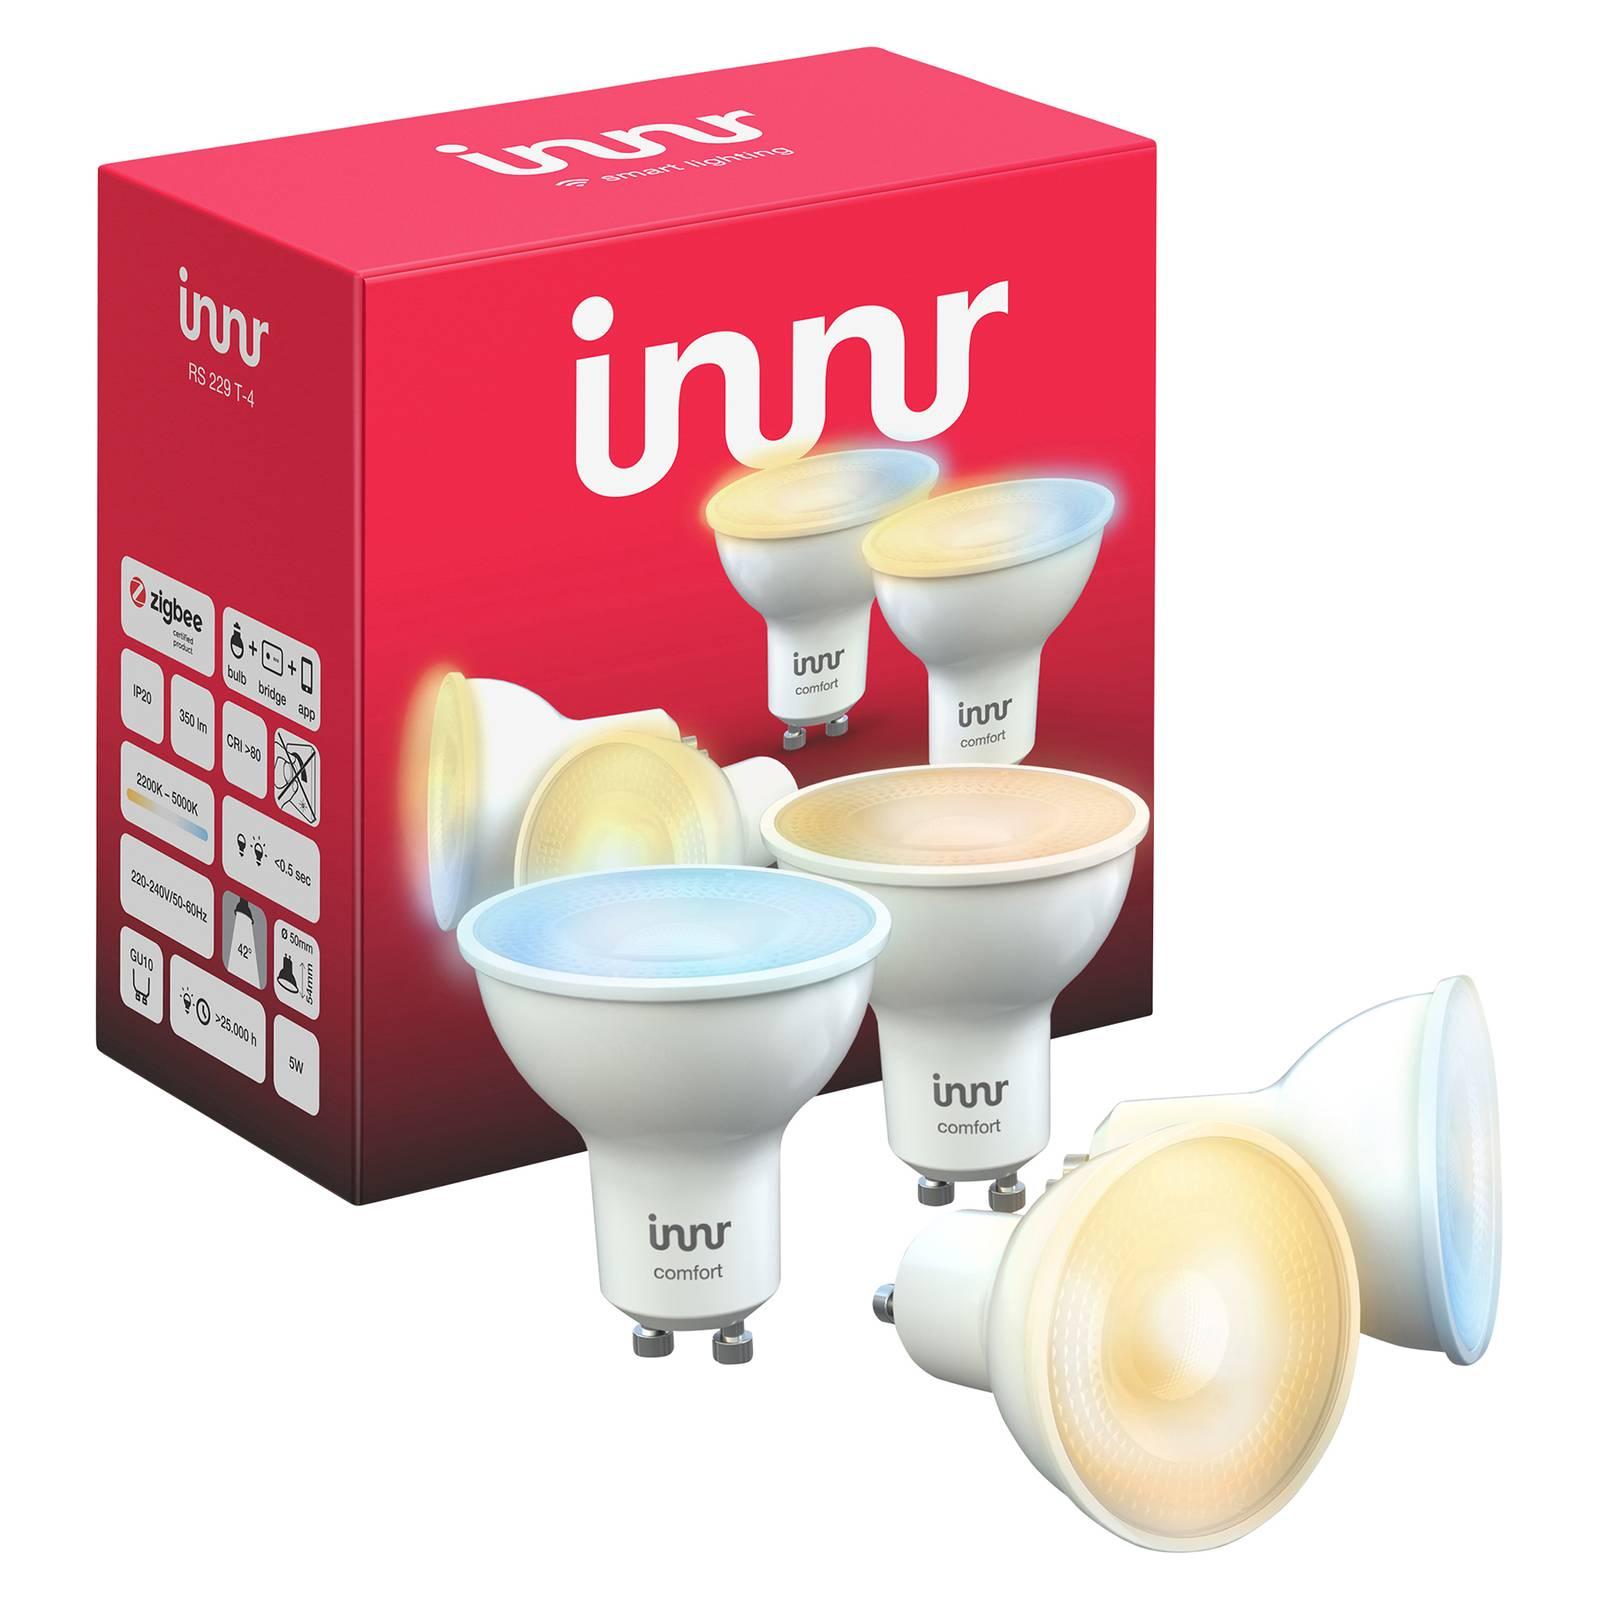 Innr LED-spotti GU10 5W 350lm, 2200–5000 K, 4 kpl